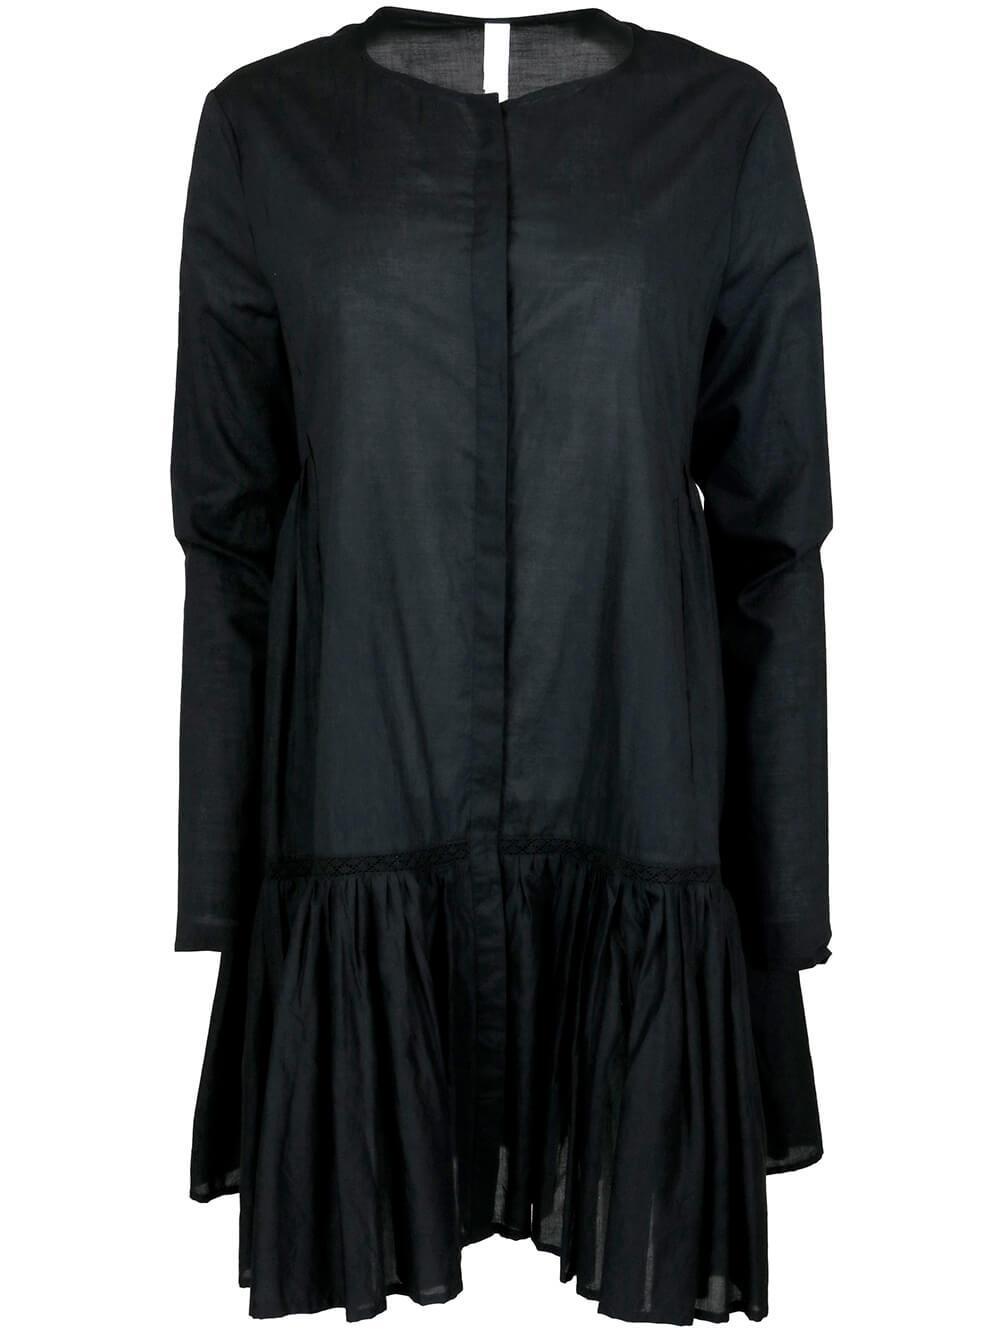 Mertel Dress Item # 1C5N12L